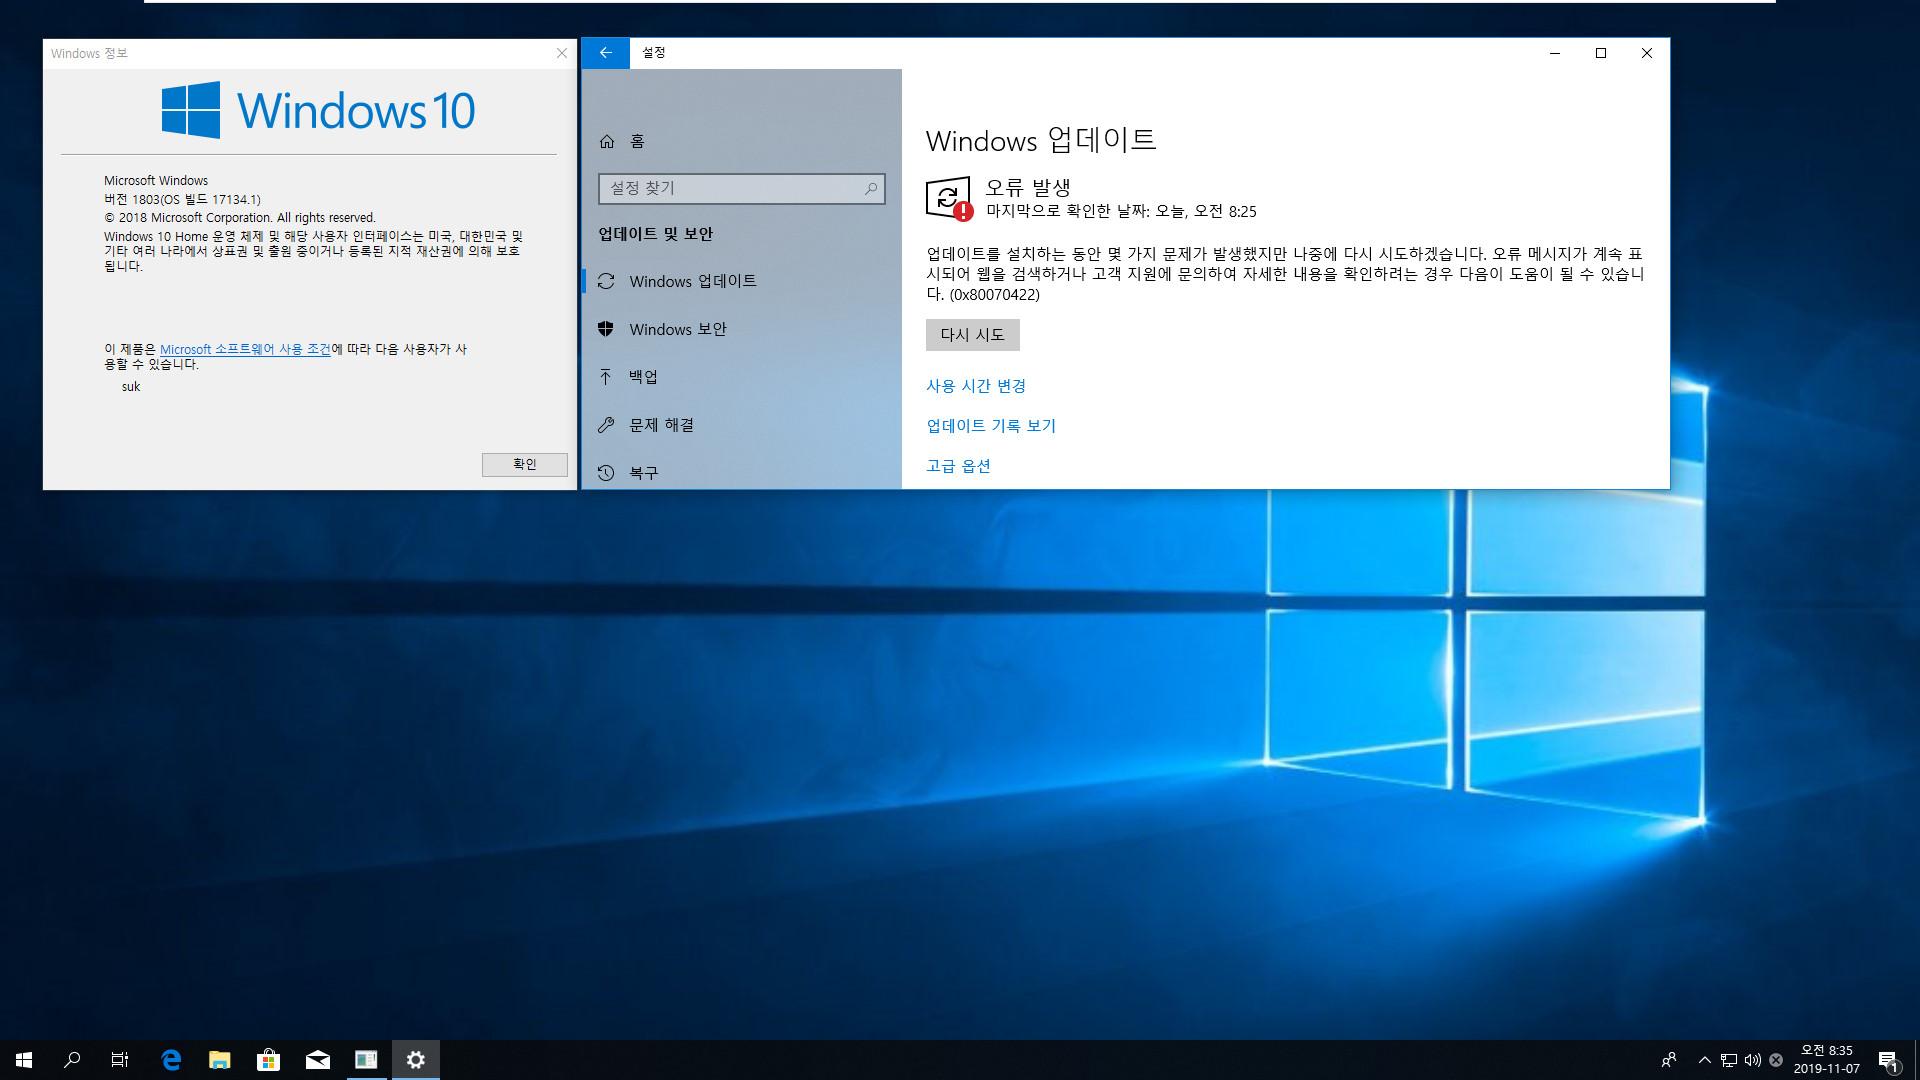 Windows 10 업데이트 방지하기 [업데이트 다운로드 폴더 사용 금지].bat 테스트 - 버전 1803, Home 에서 버전 1903 기능 업데이트 방지하기 2019-11-07_083542.jpg